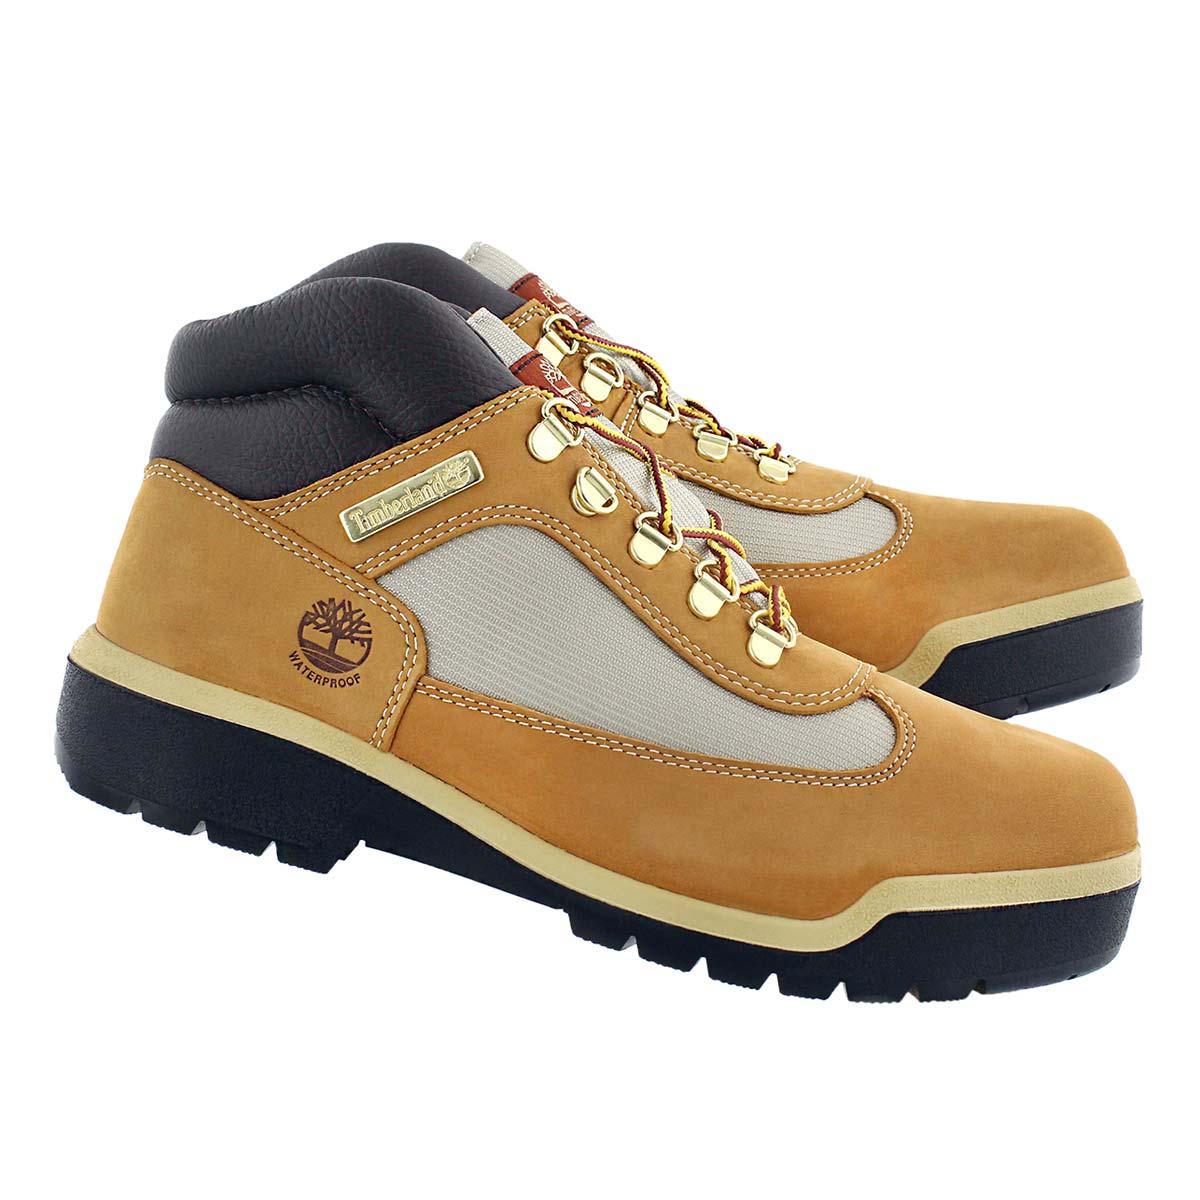 Mns Field wheat hiking boot